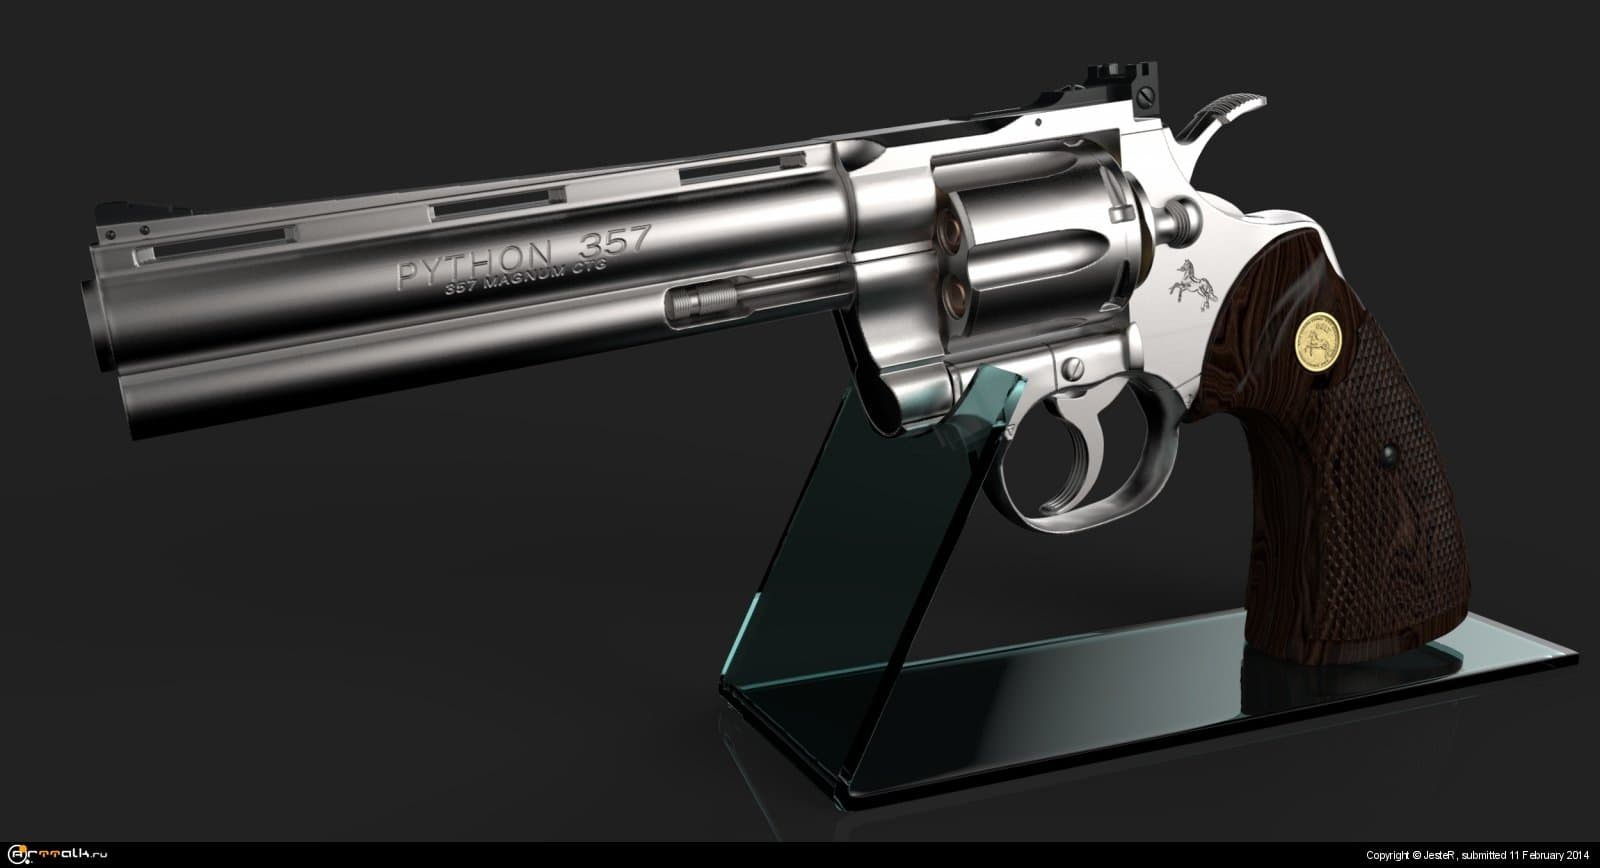 Colt Python 357 Magnum (Питон)